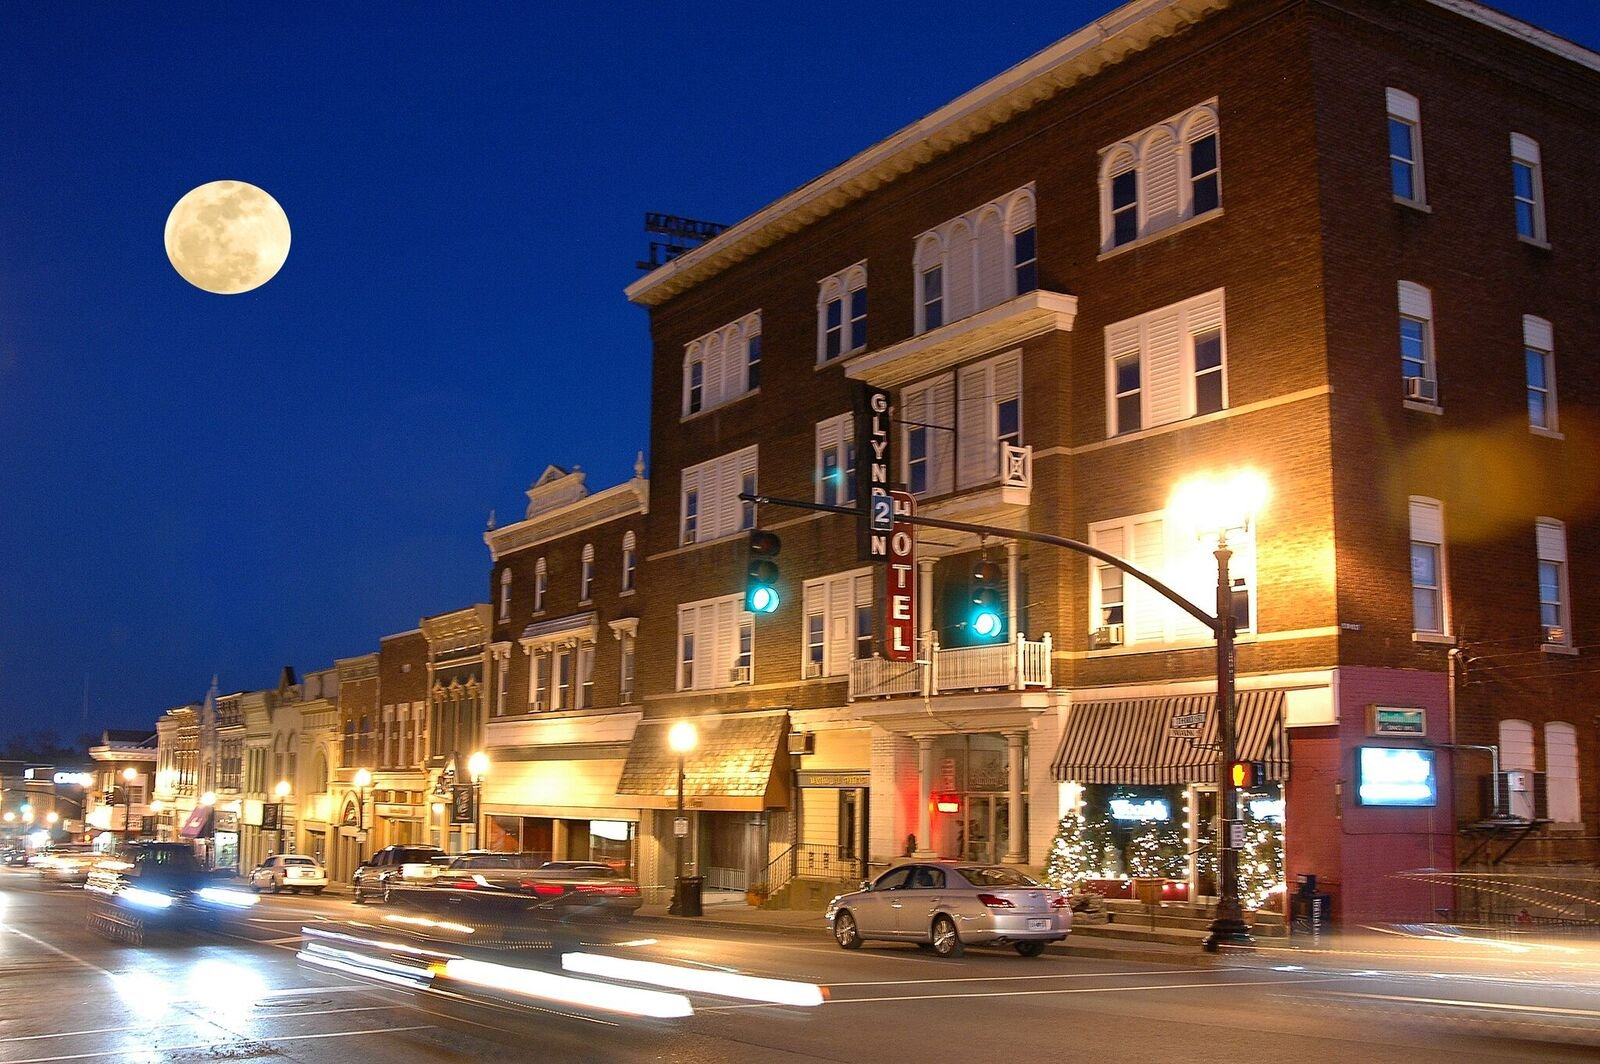 Downtown Richmond at night.